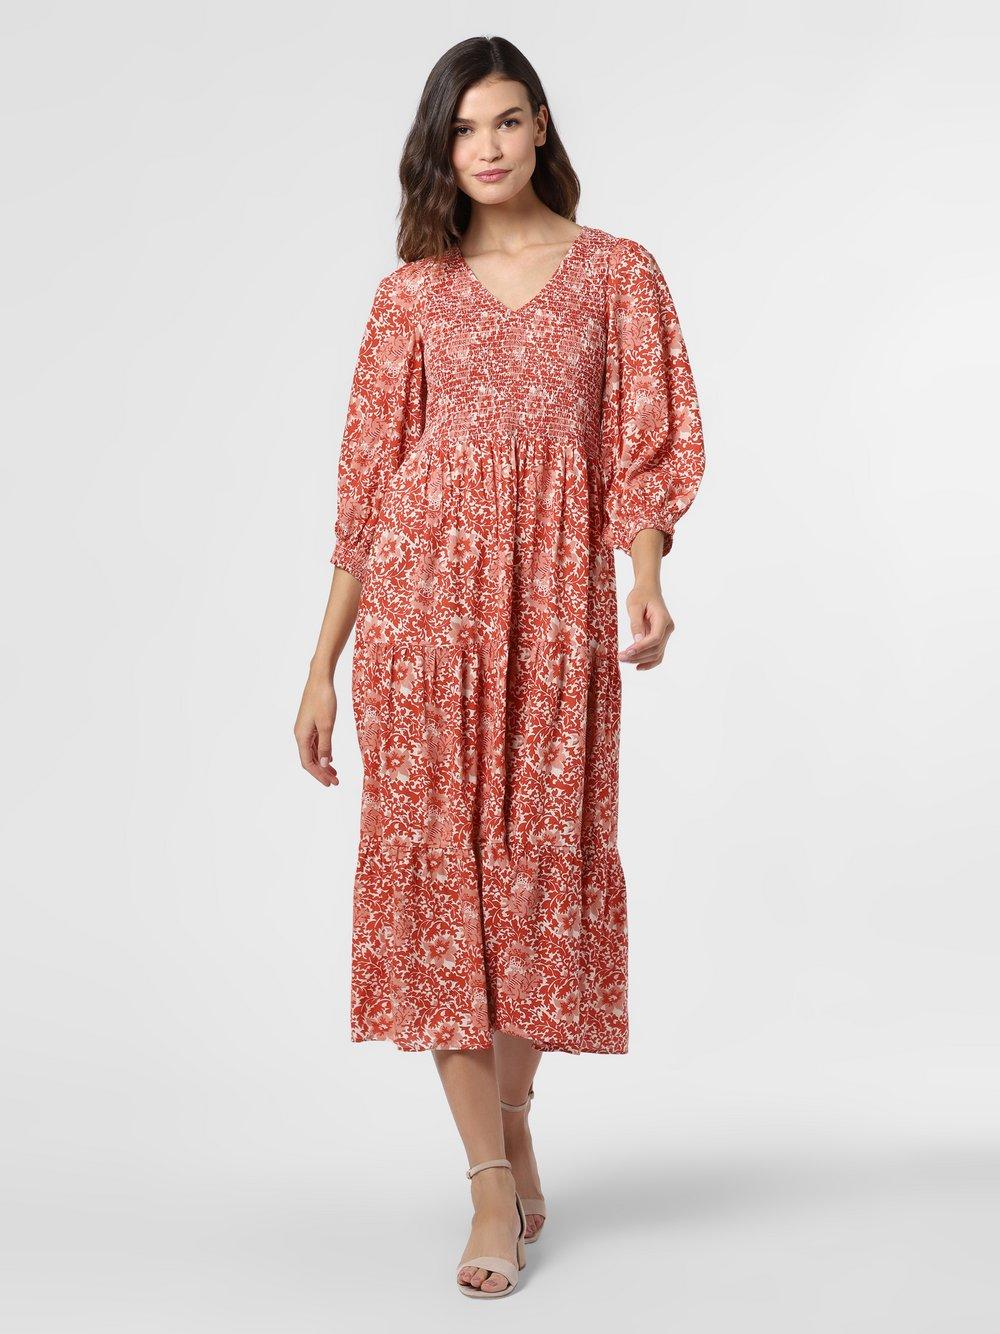 Y.A.S – Sukienka damska – YASDamask, pomarańczowy Van Graaf 477532-0001-09960